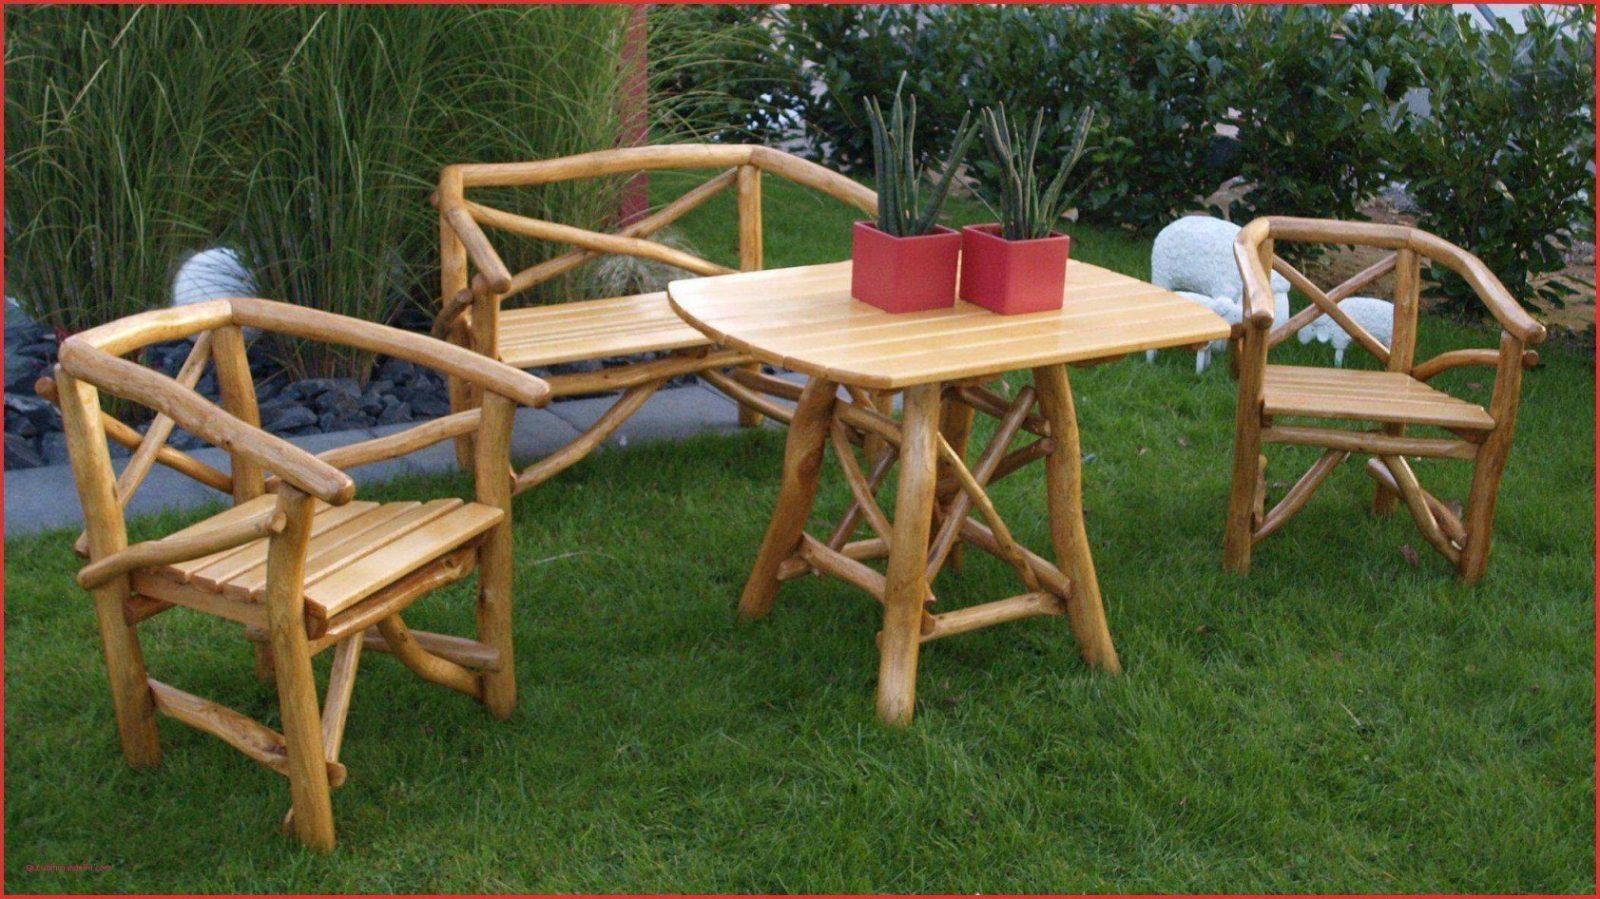 75 Rustikale Holz Gartenmöbel Aus Polen  Evercreative von Rustikale Gartenmöbel Aus Polen Bild